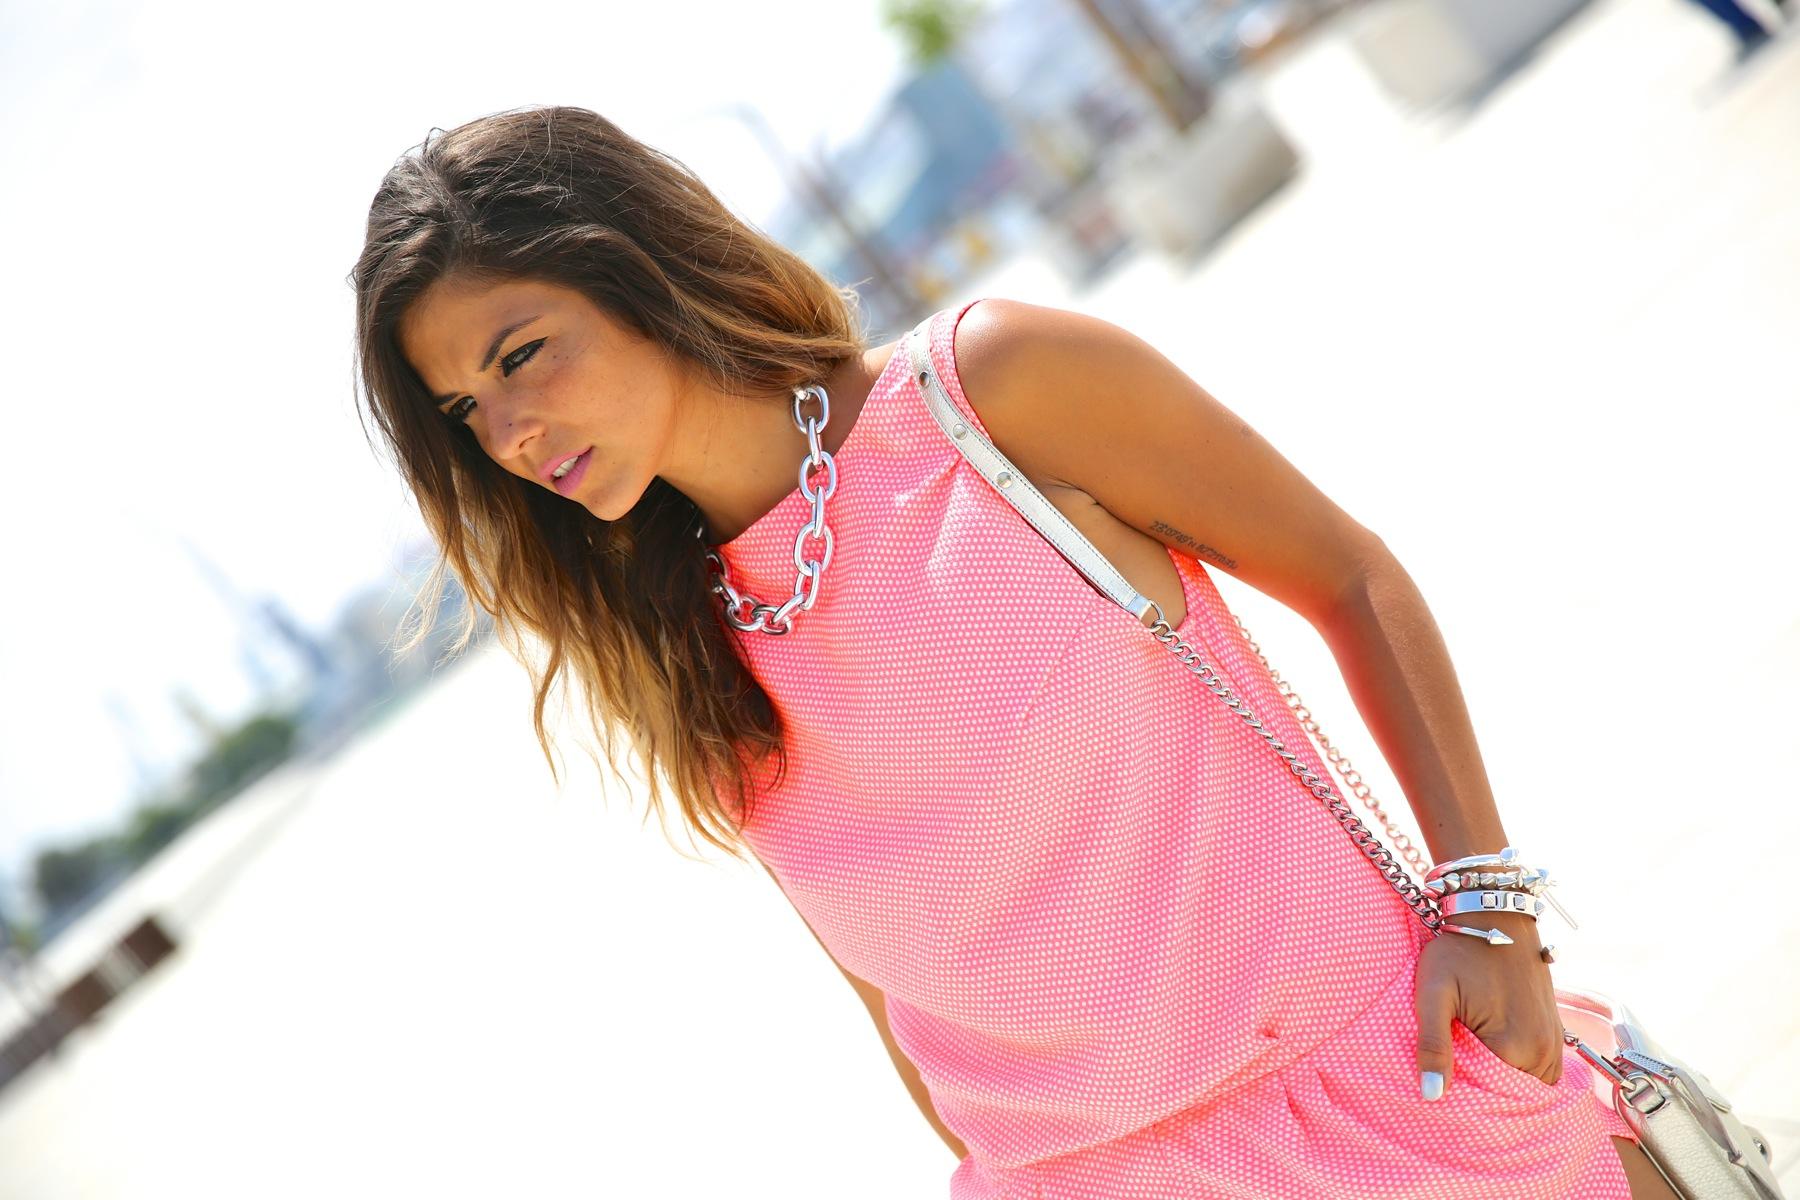 trendy_taste-look-outfit-street_style-ootd-blog-blogger-fashion_spain-moda_españa-silver_bag-bolso_plata-mono_rosa-mekdes-coruña-marina-6